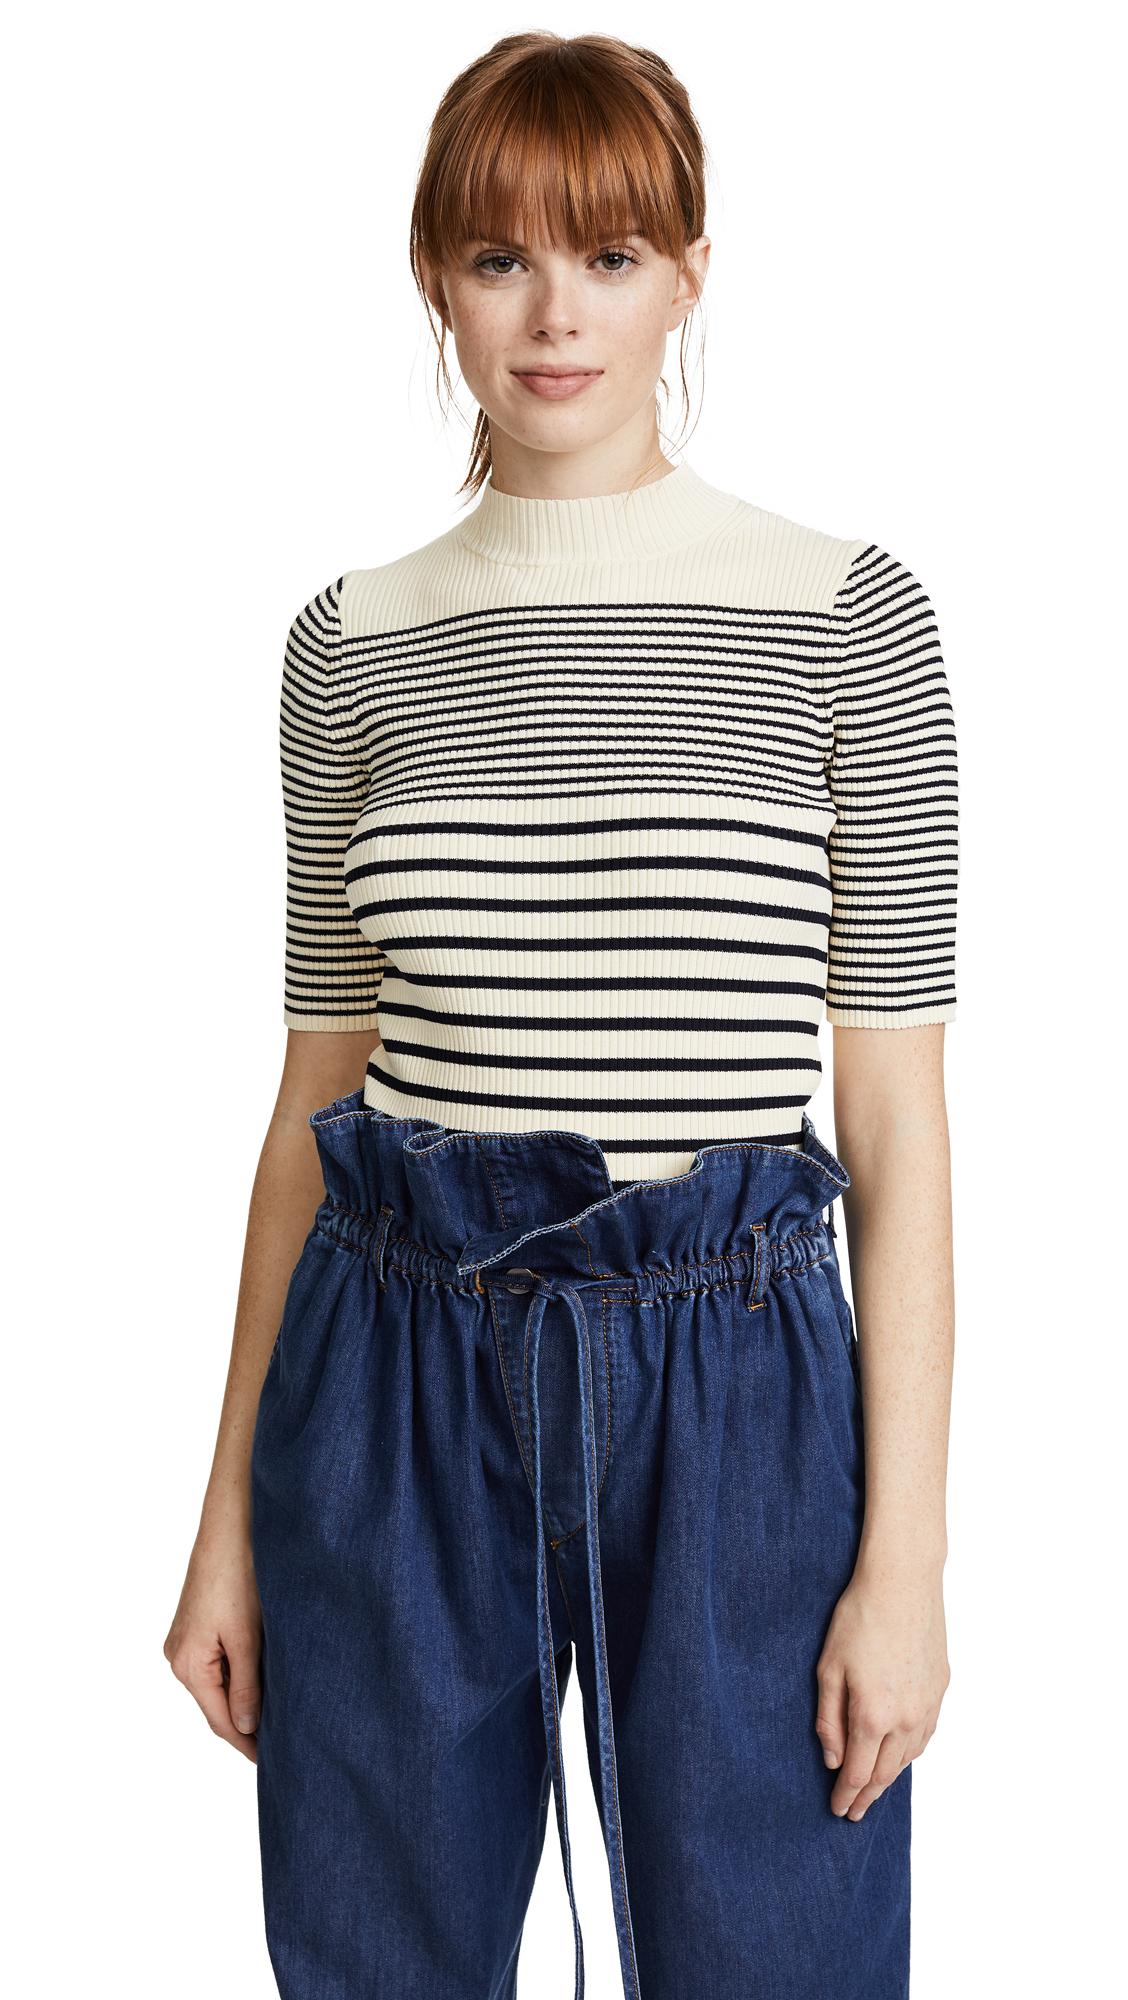 Acne Studios Winnie Stripe Sweater - Cream White/Midnight Blue